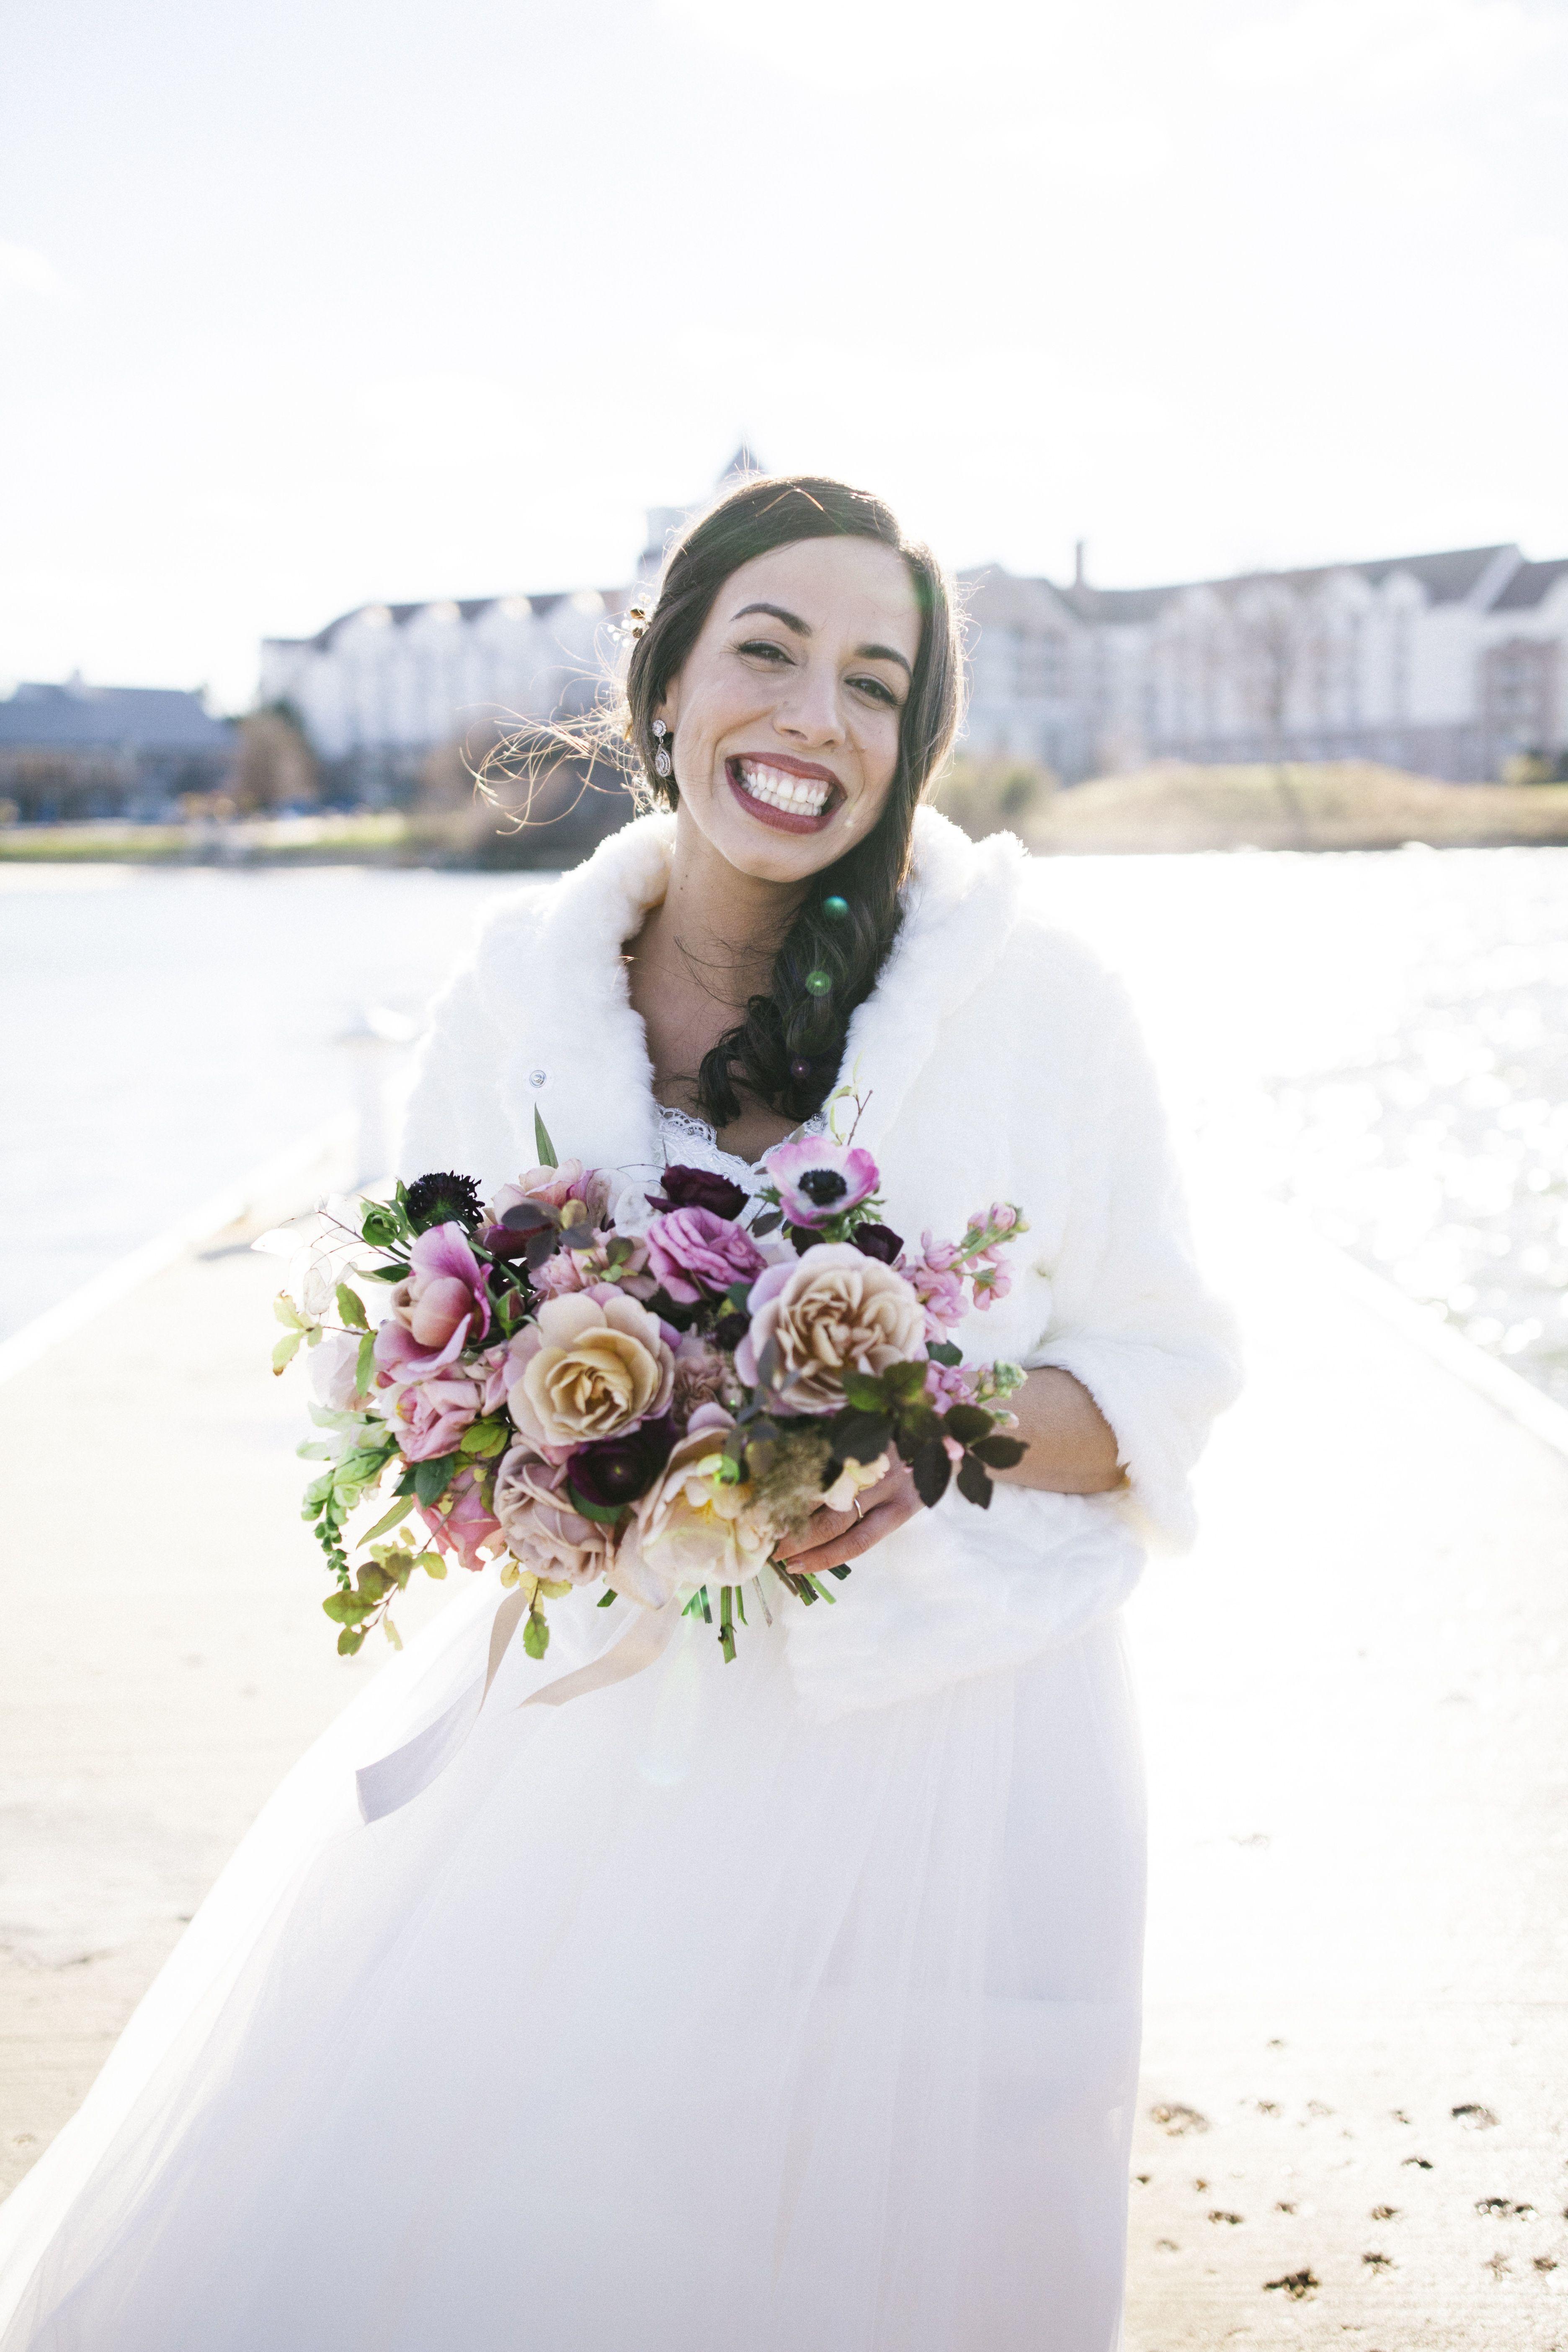 Winter Weddings at Hyatt Regency Chesapeake Bay (Photographer ...